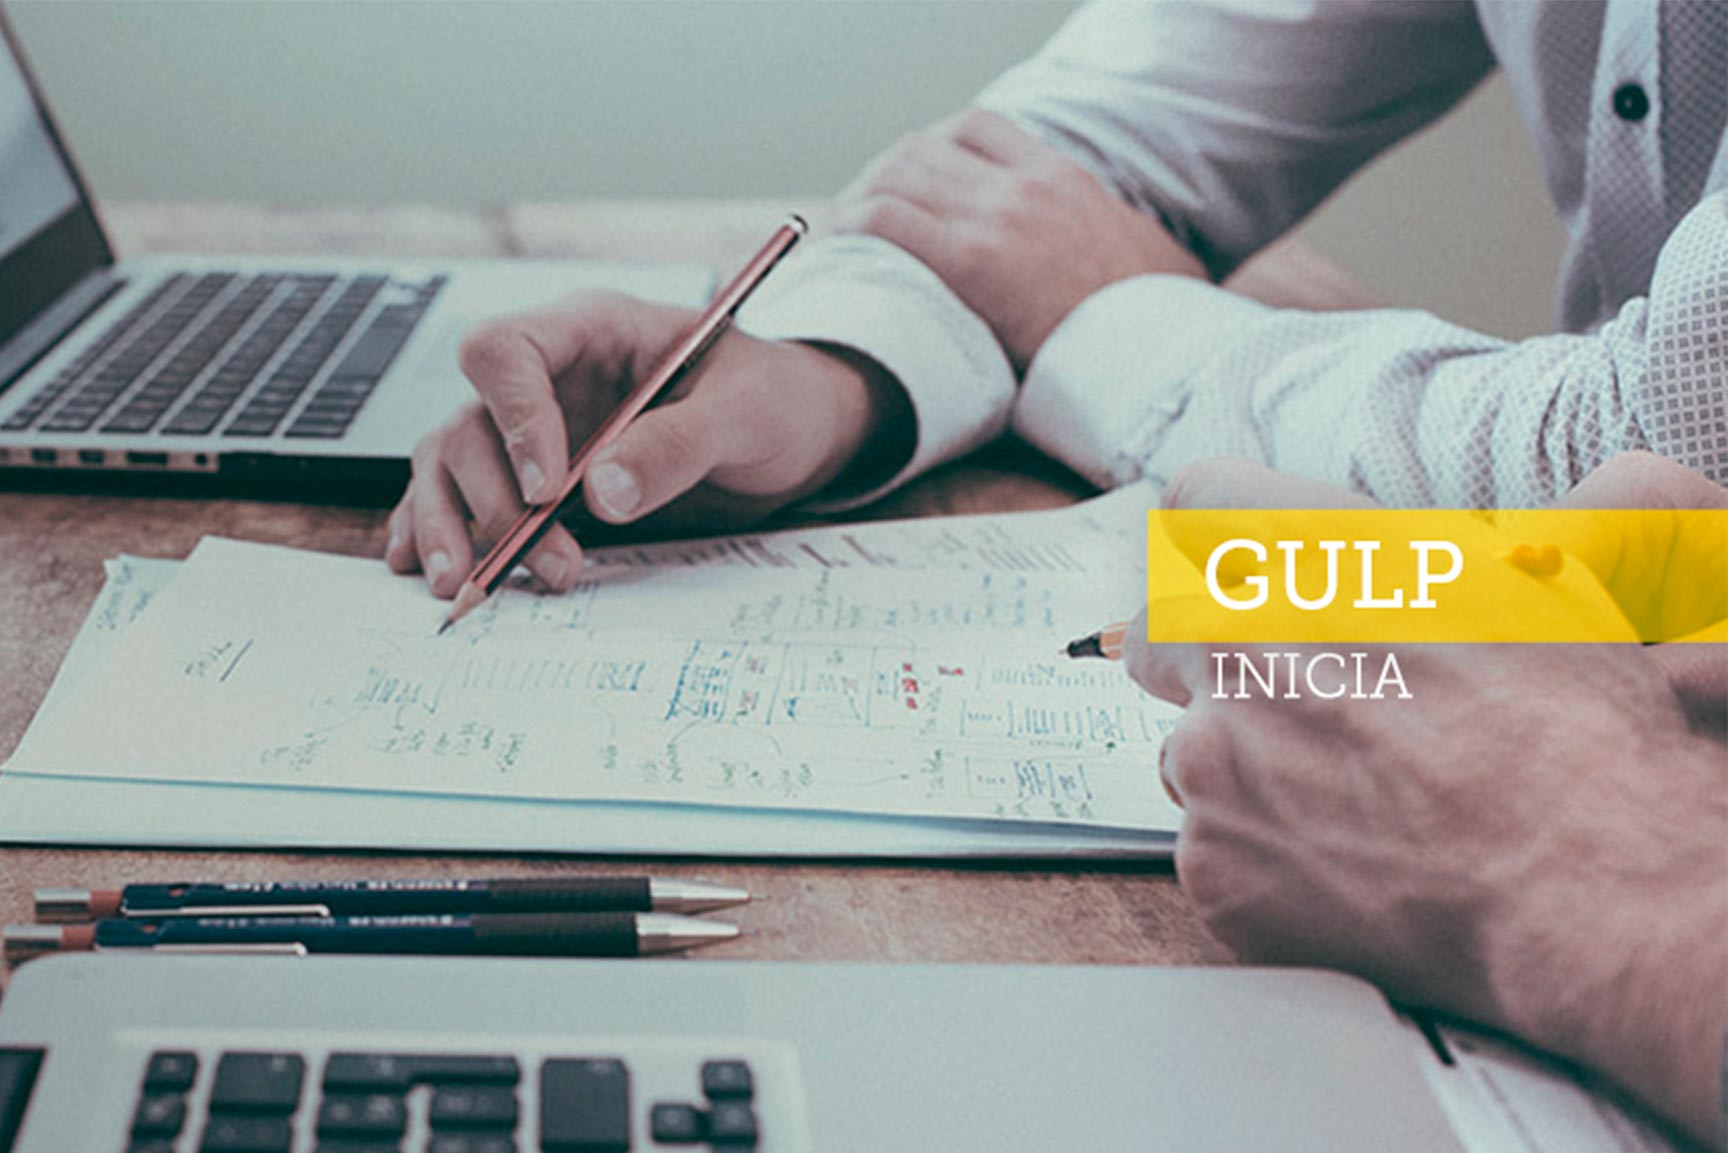 h_gulp_inicia